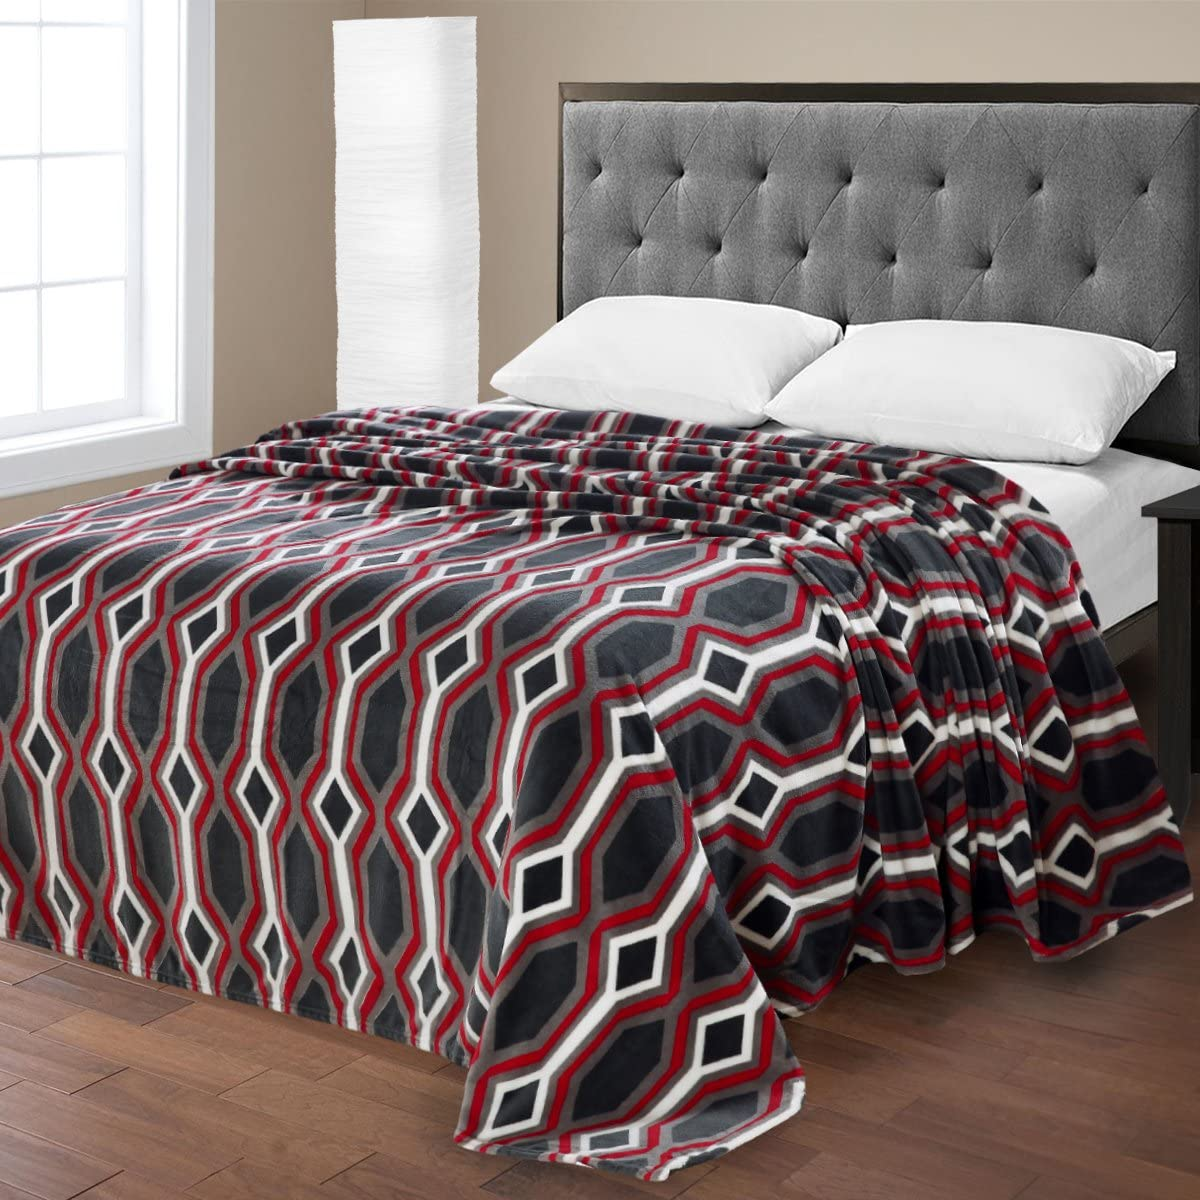 Super Plush Chevron Print Micro Fleece Jacquard Polyester Blanket Queen Beige